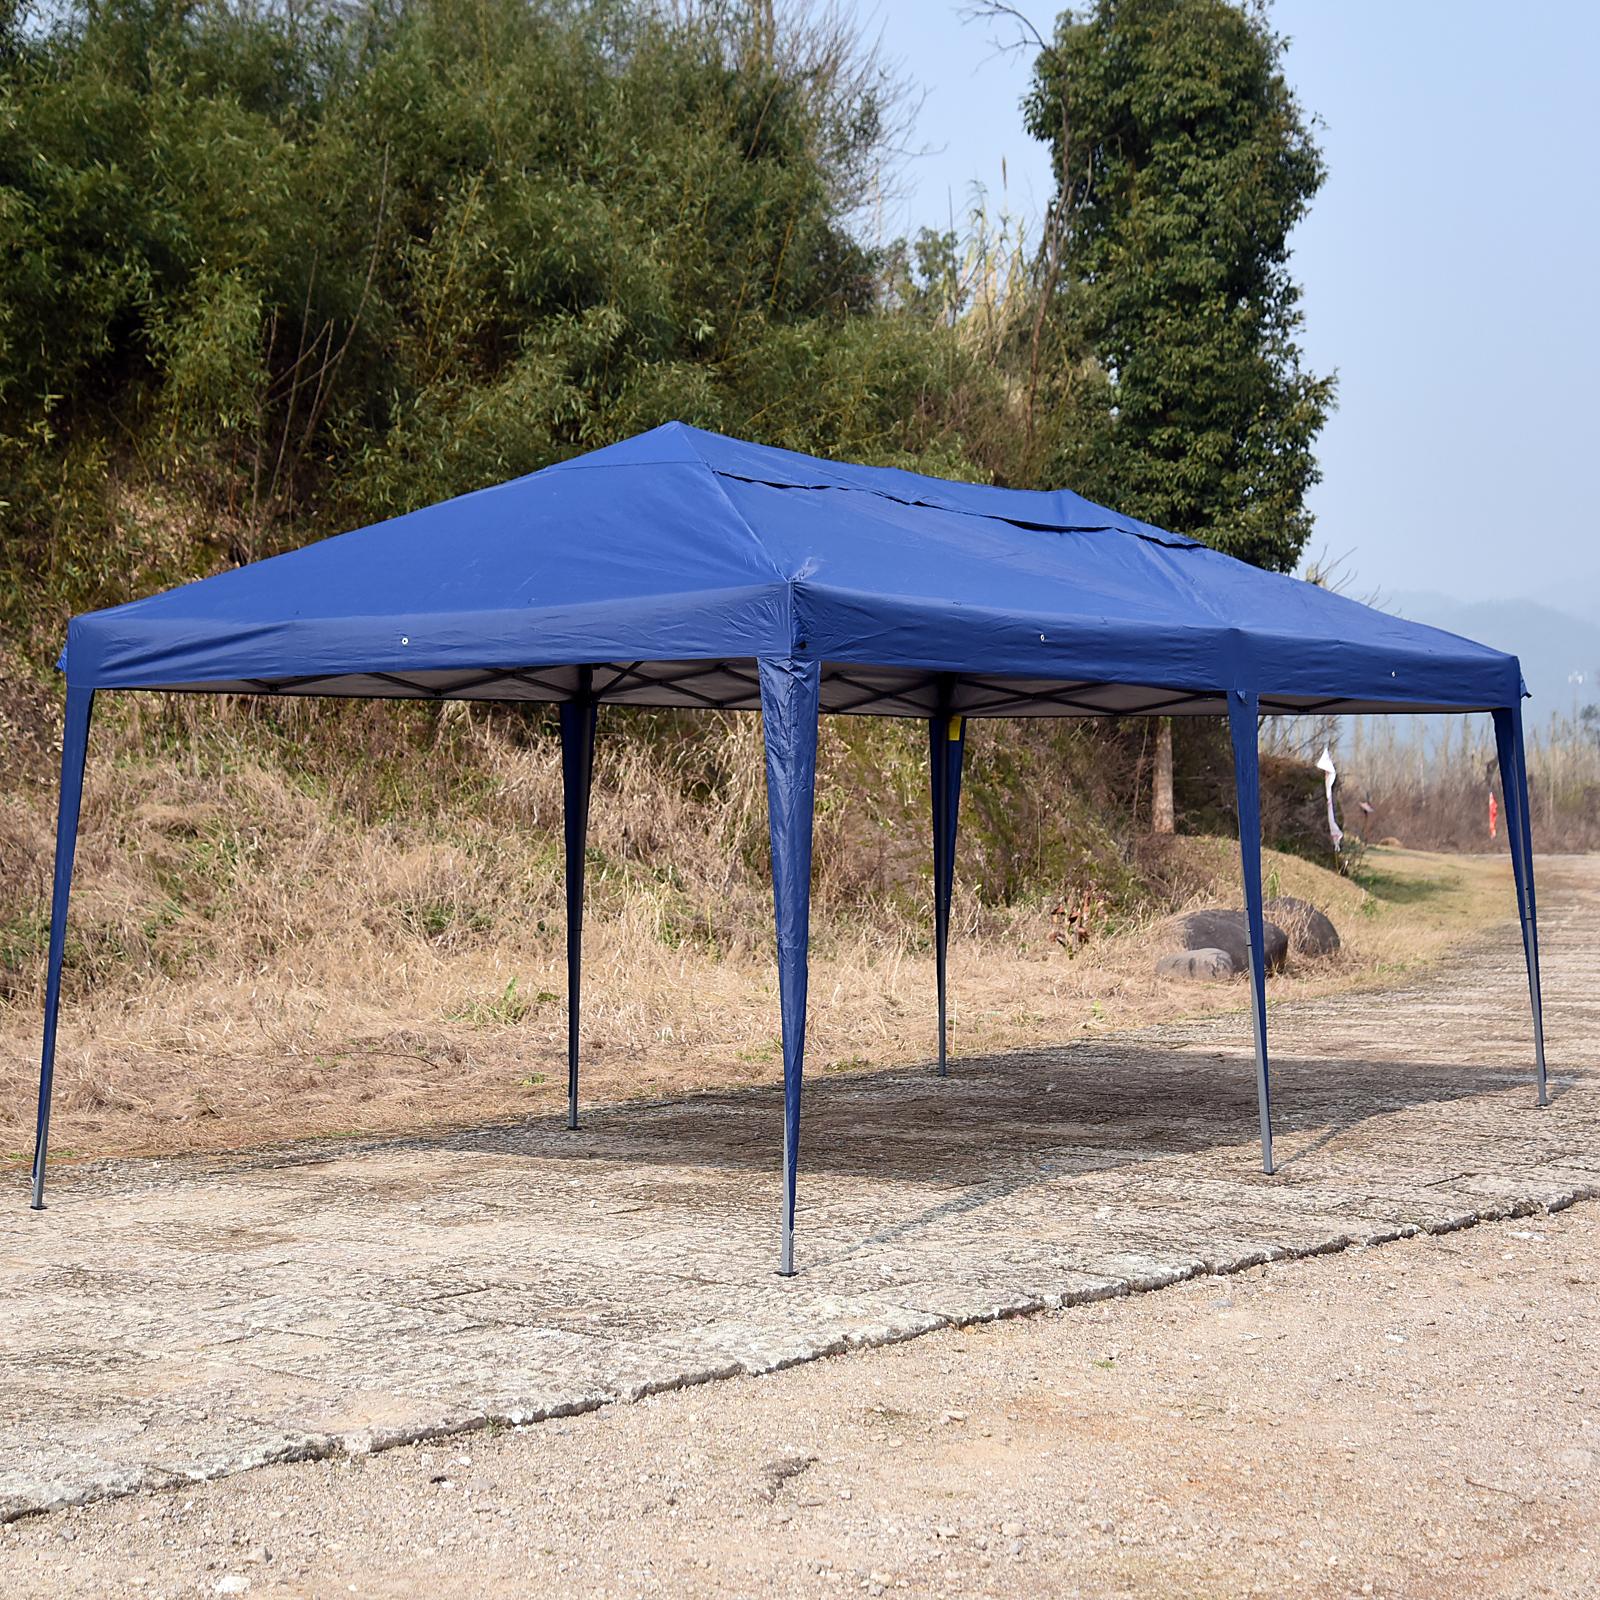 Outdoor-10-039-x20-039-EZ-POP-UP-Gazebo-Wedding-Party-Tent-Canopy-Folding-w-Carry-Bag thumbnail 5